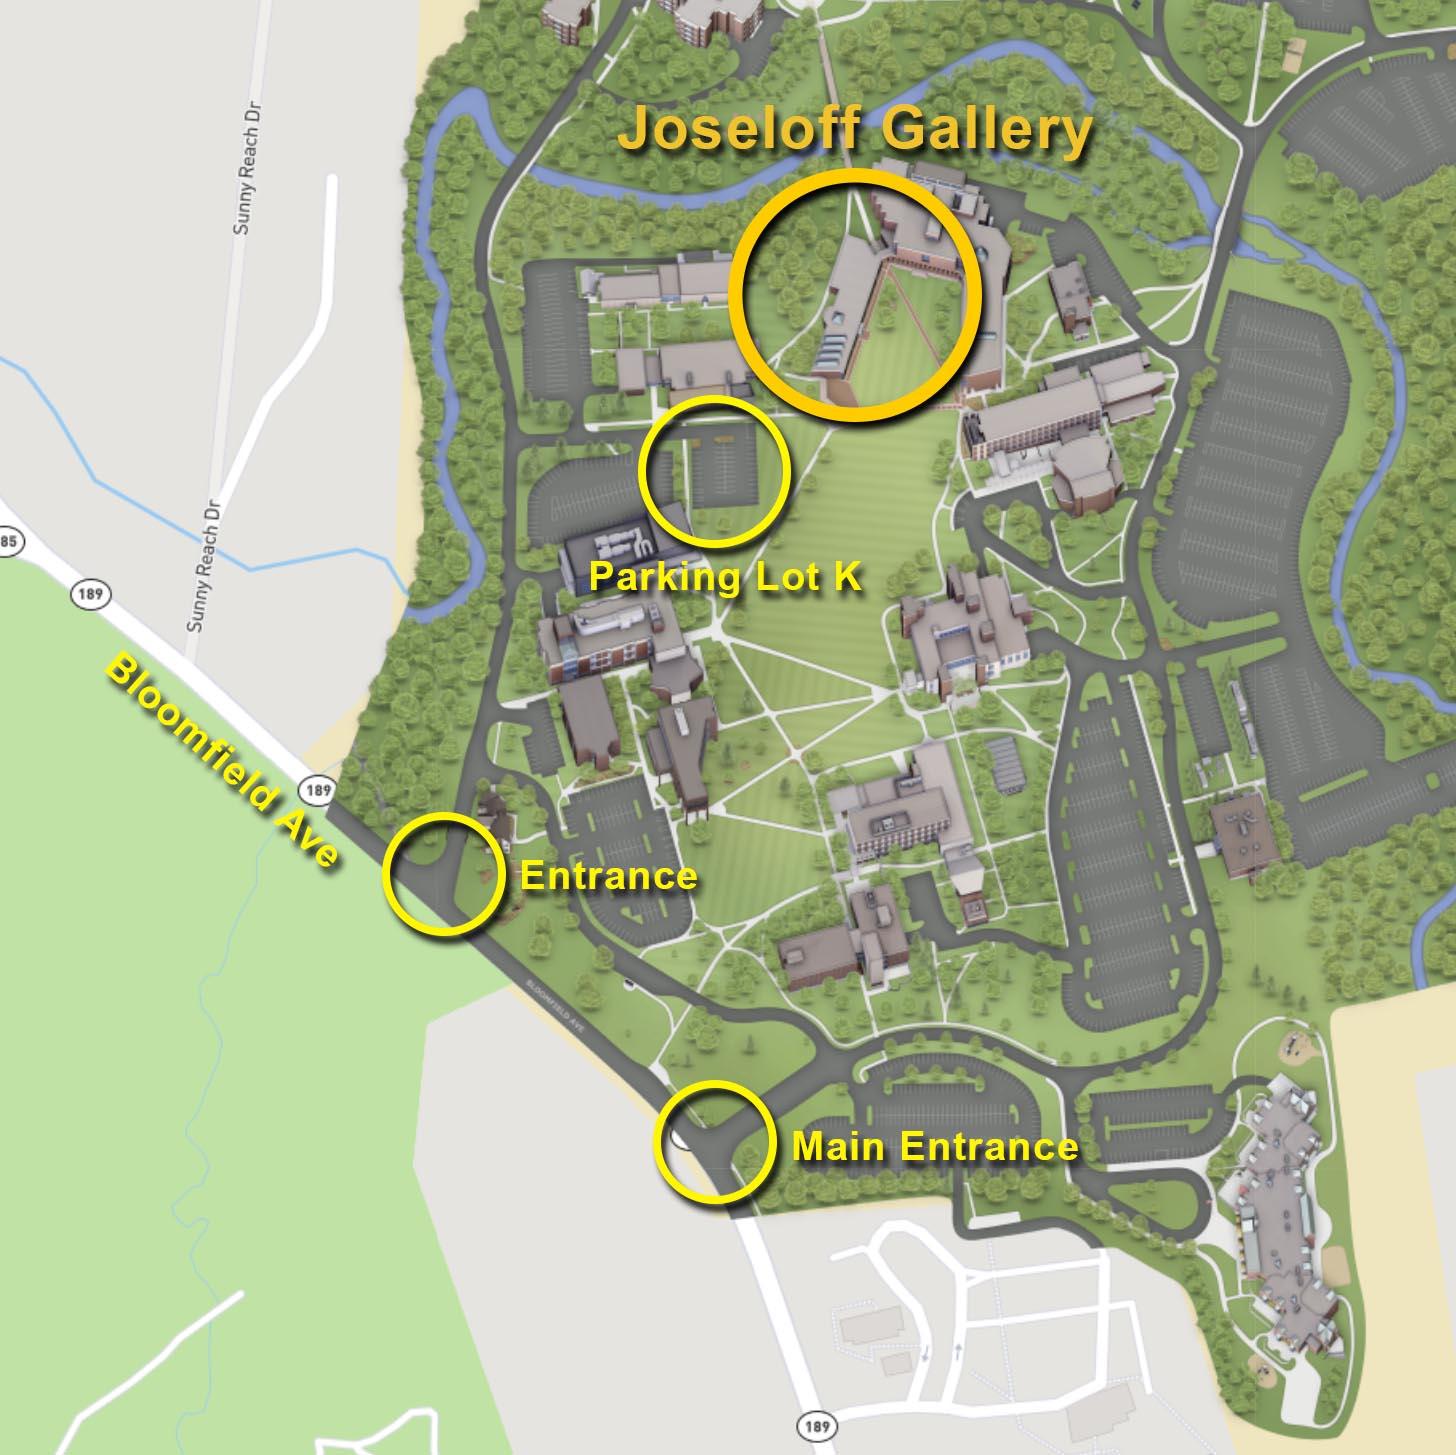 Joseloff Gallery University of Hartford Campus Map